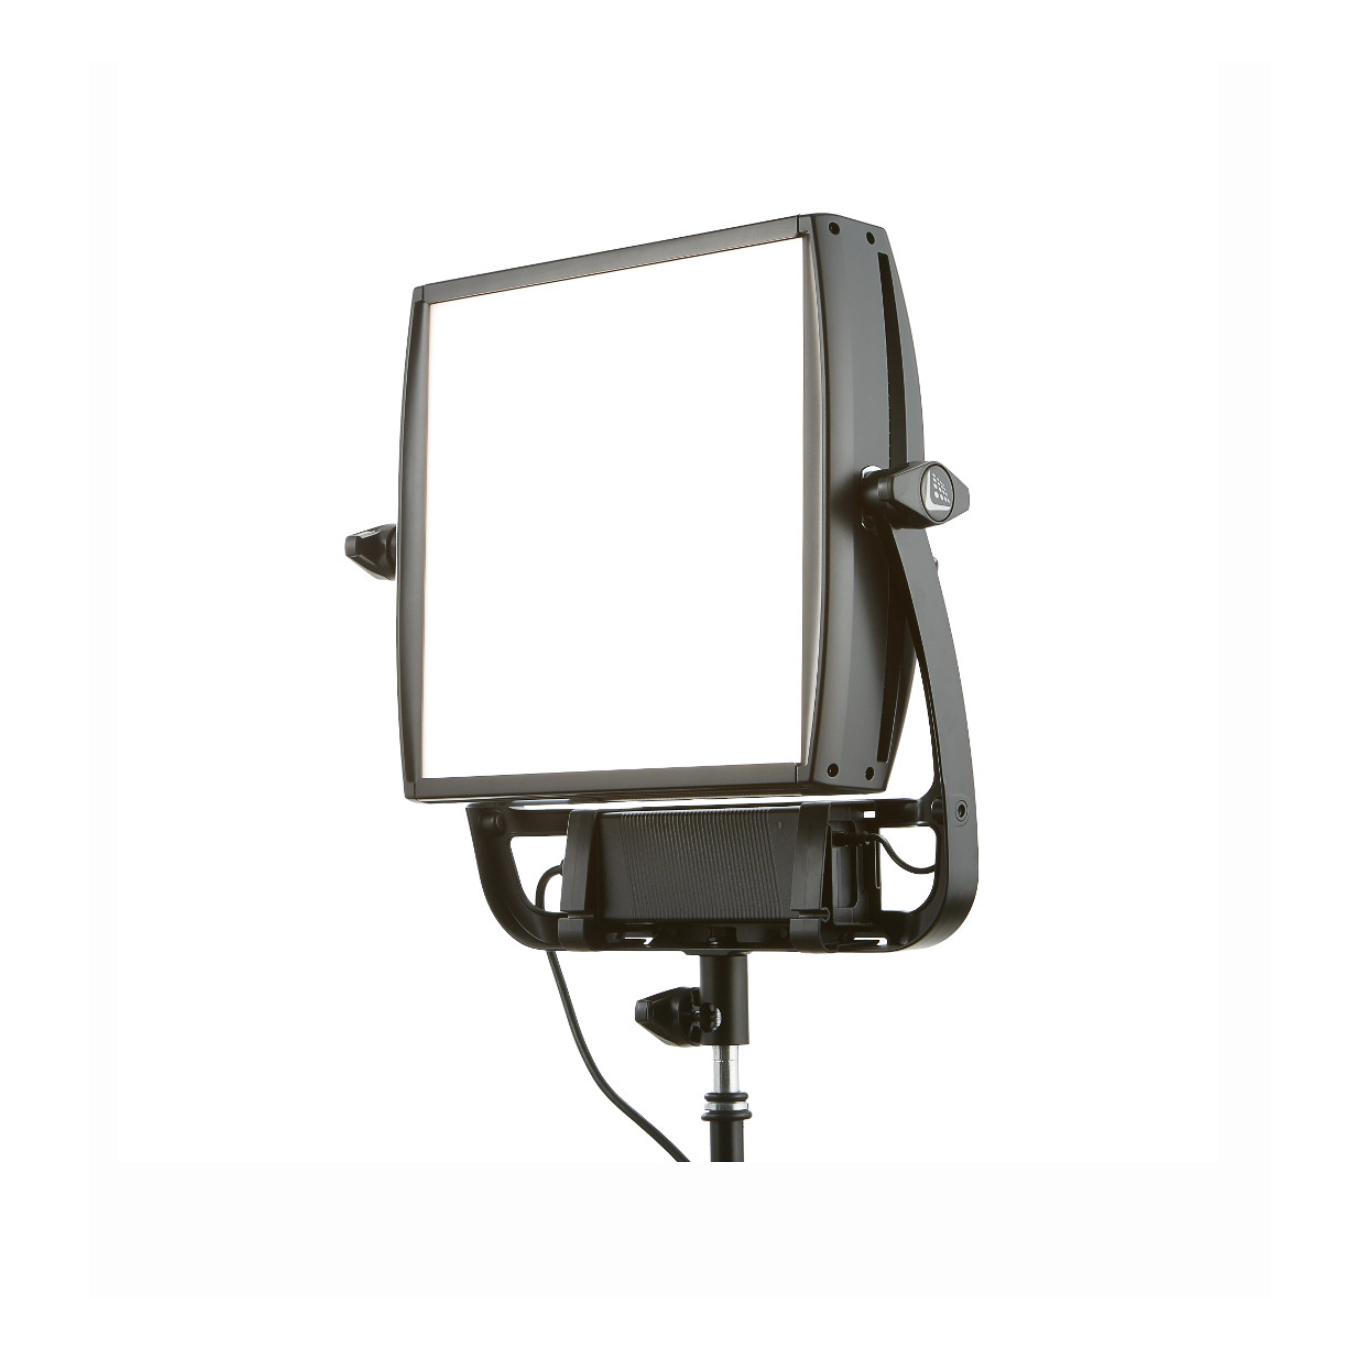 Litepanels Astra Soft Bi-color LED Panel